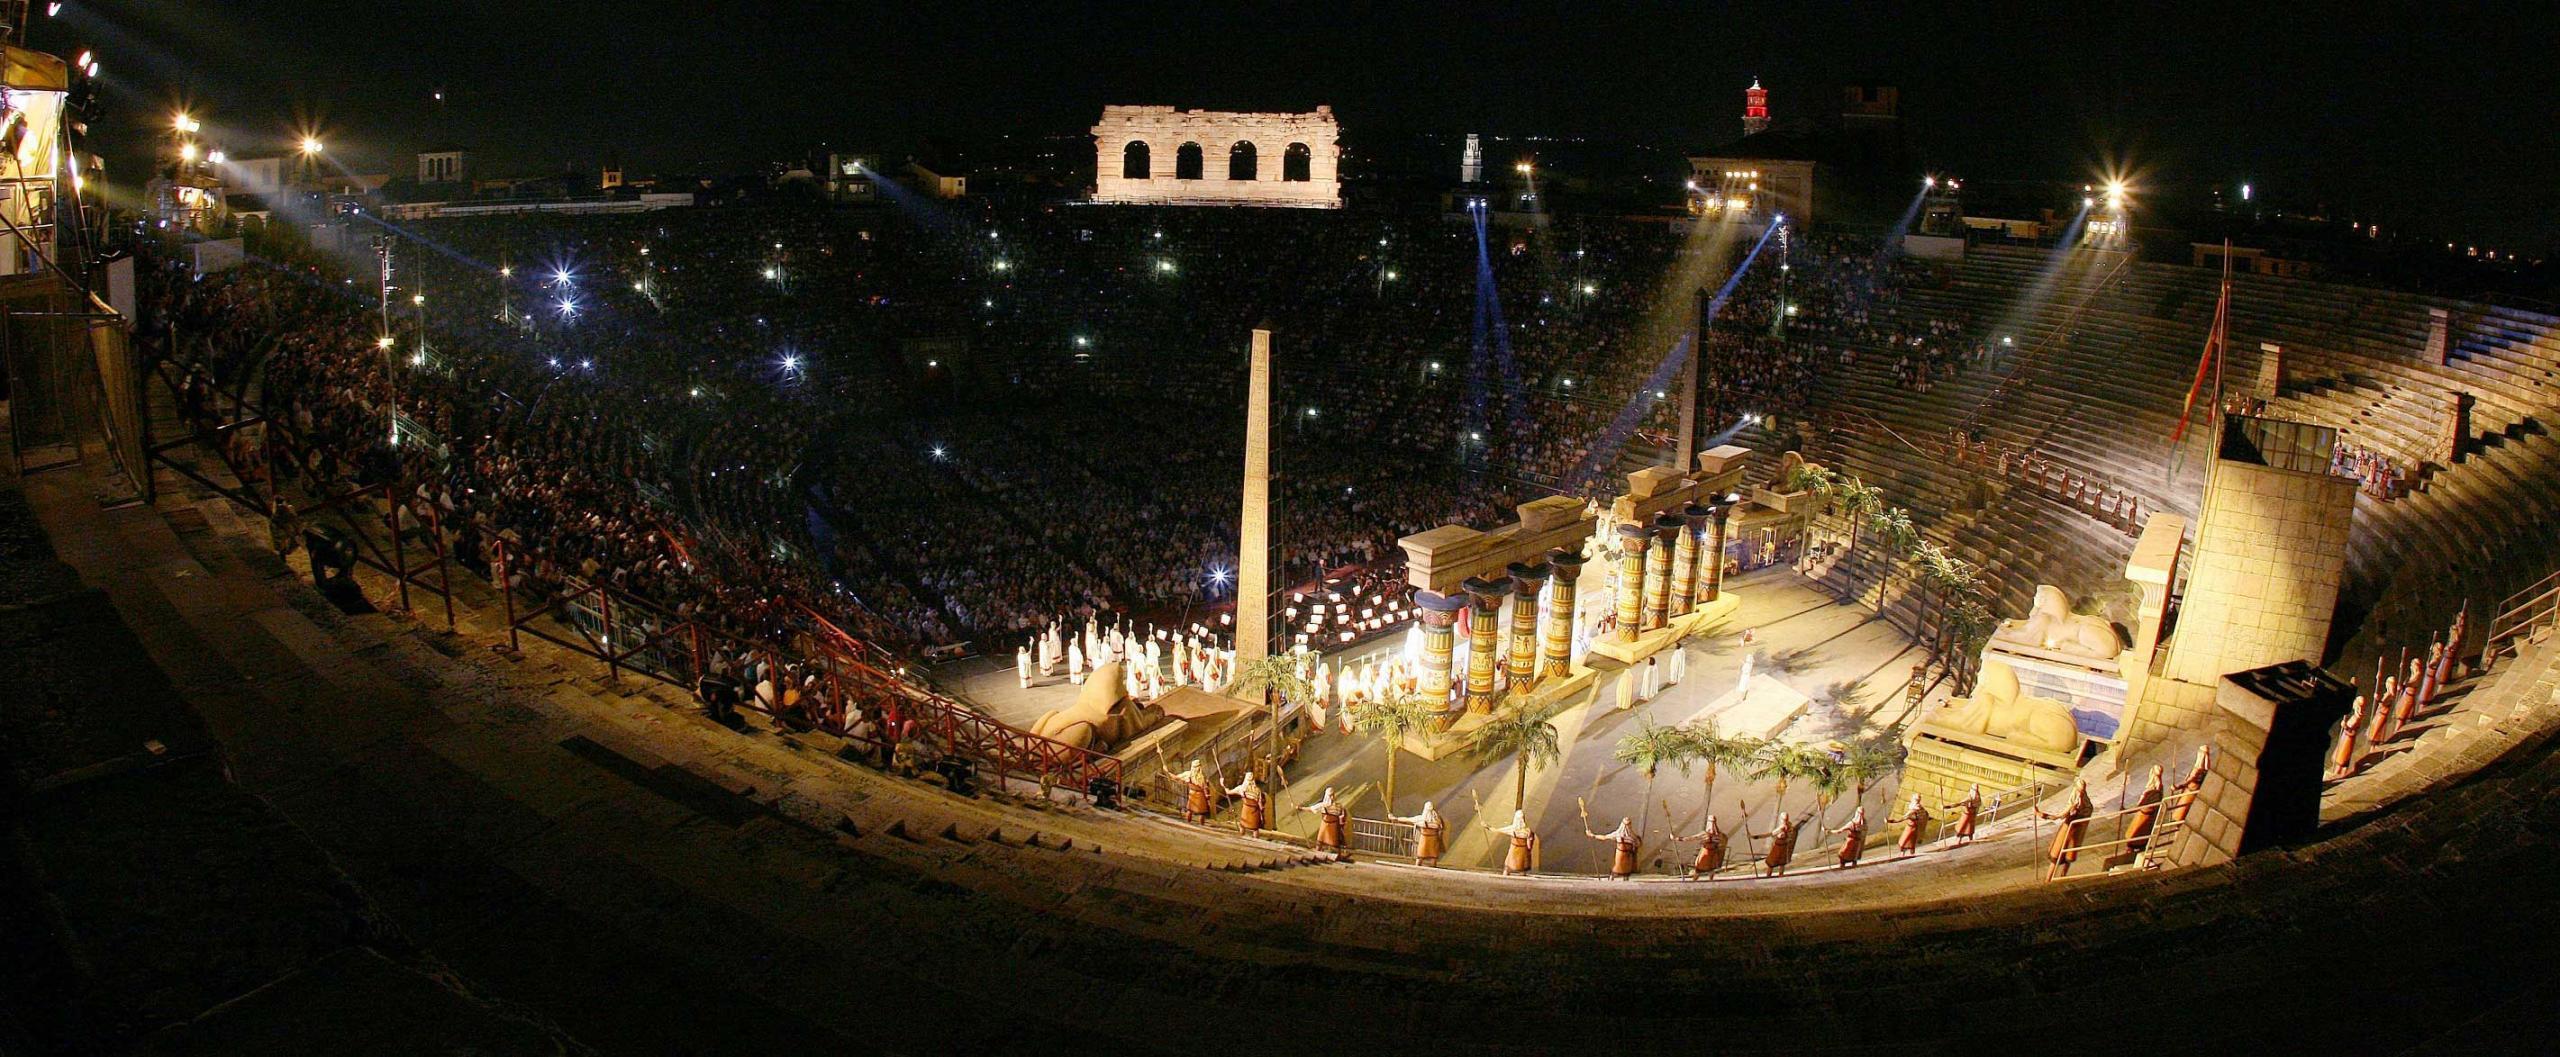 arena-immagini-slide-2011-Aida1913-Foto-Ennevi-04_2-jpg_2560x1057